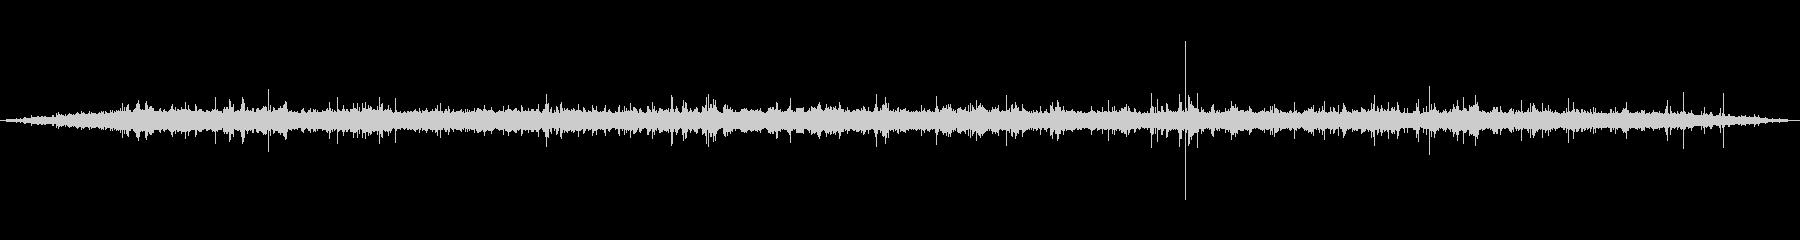 [ASMR]波打ち際の音_012の未再生の波形